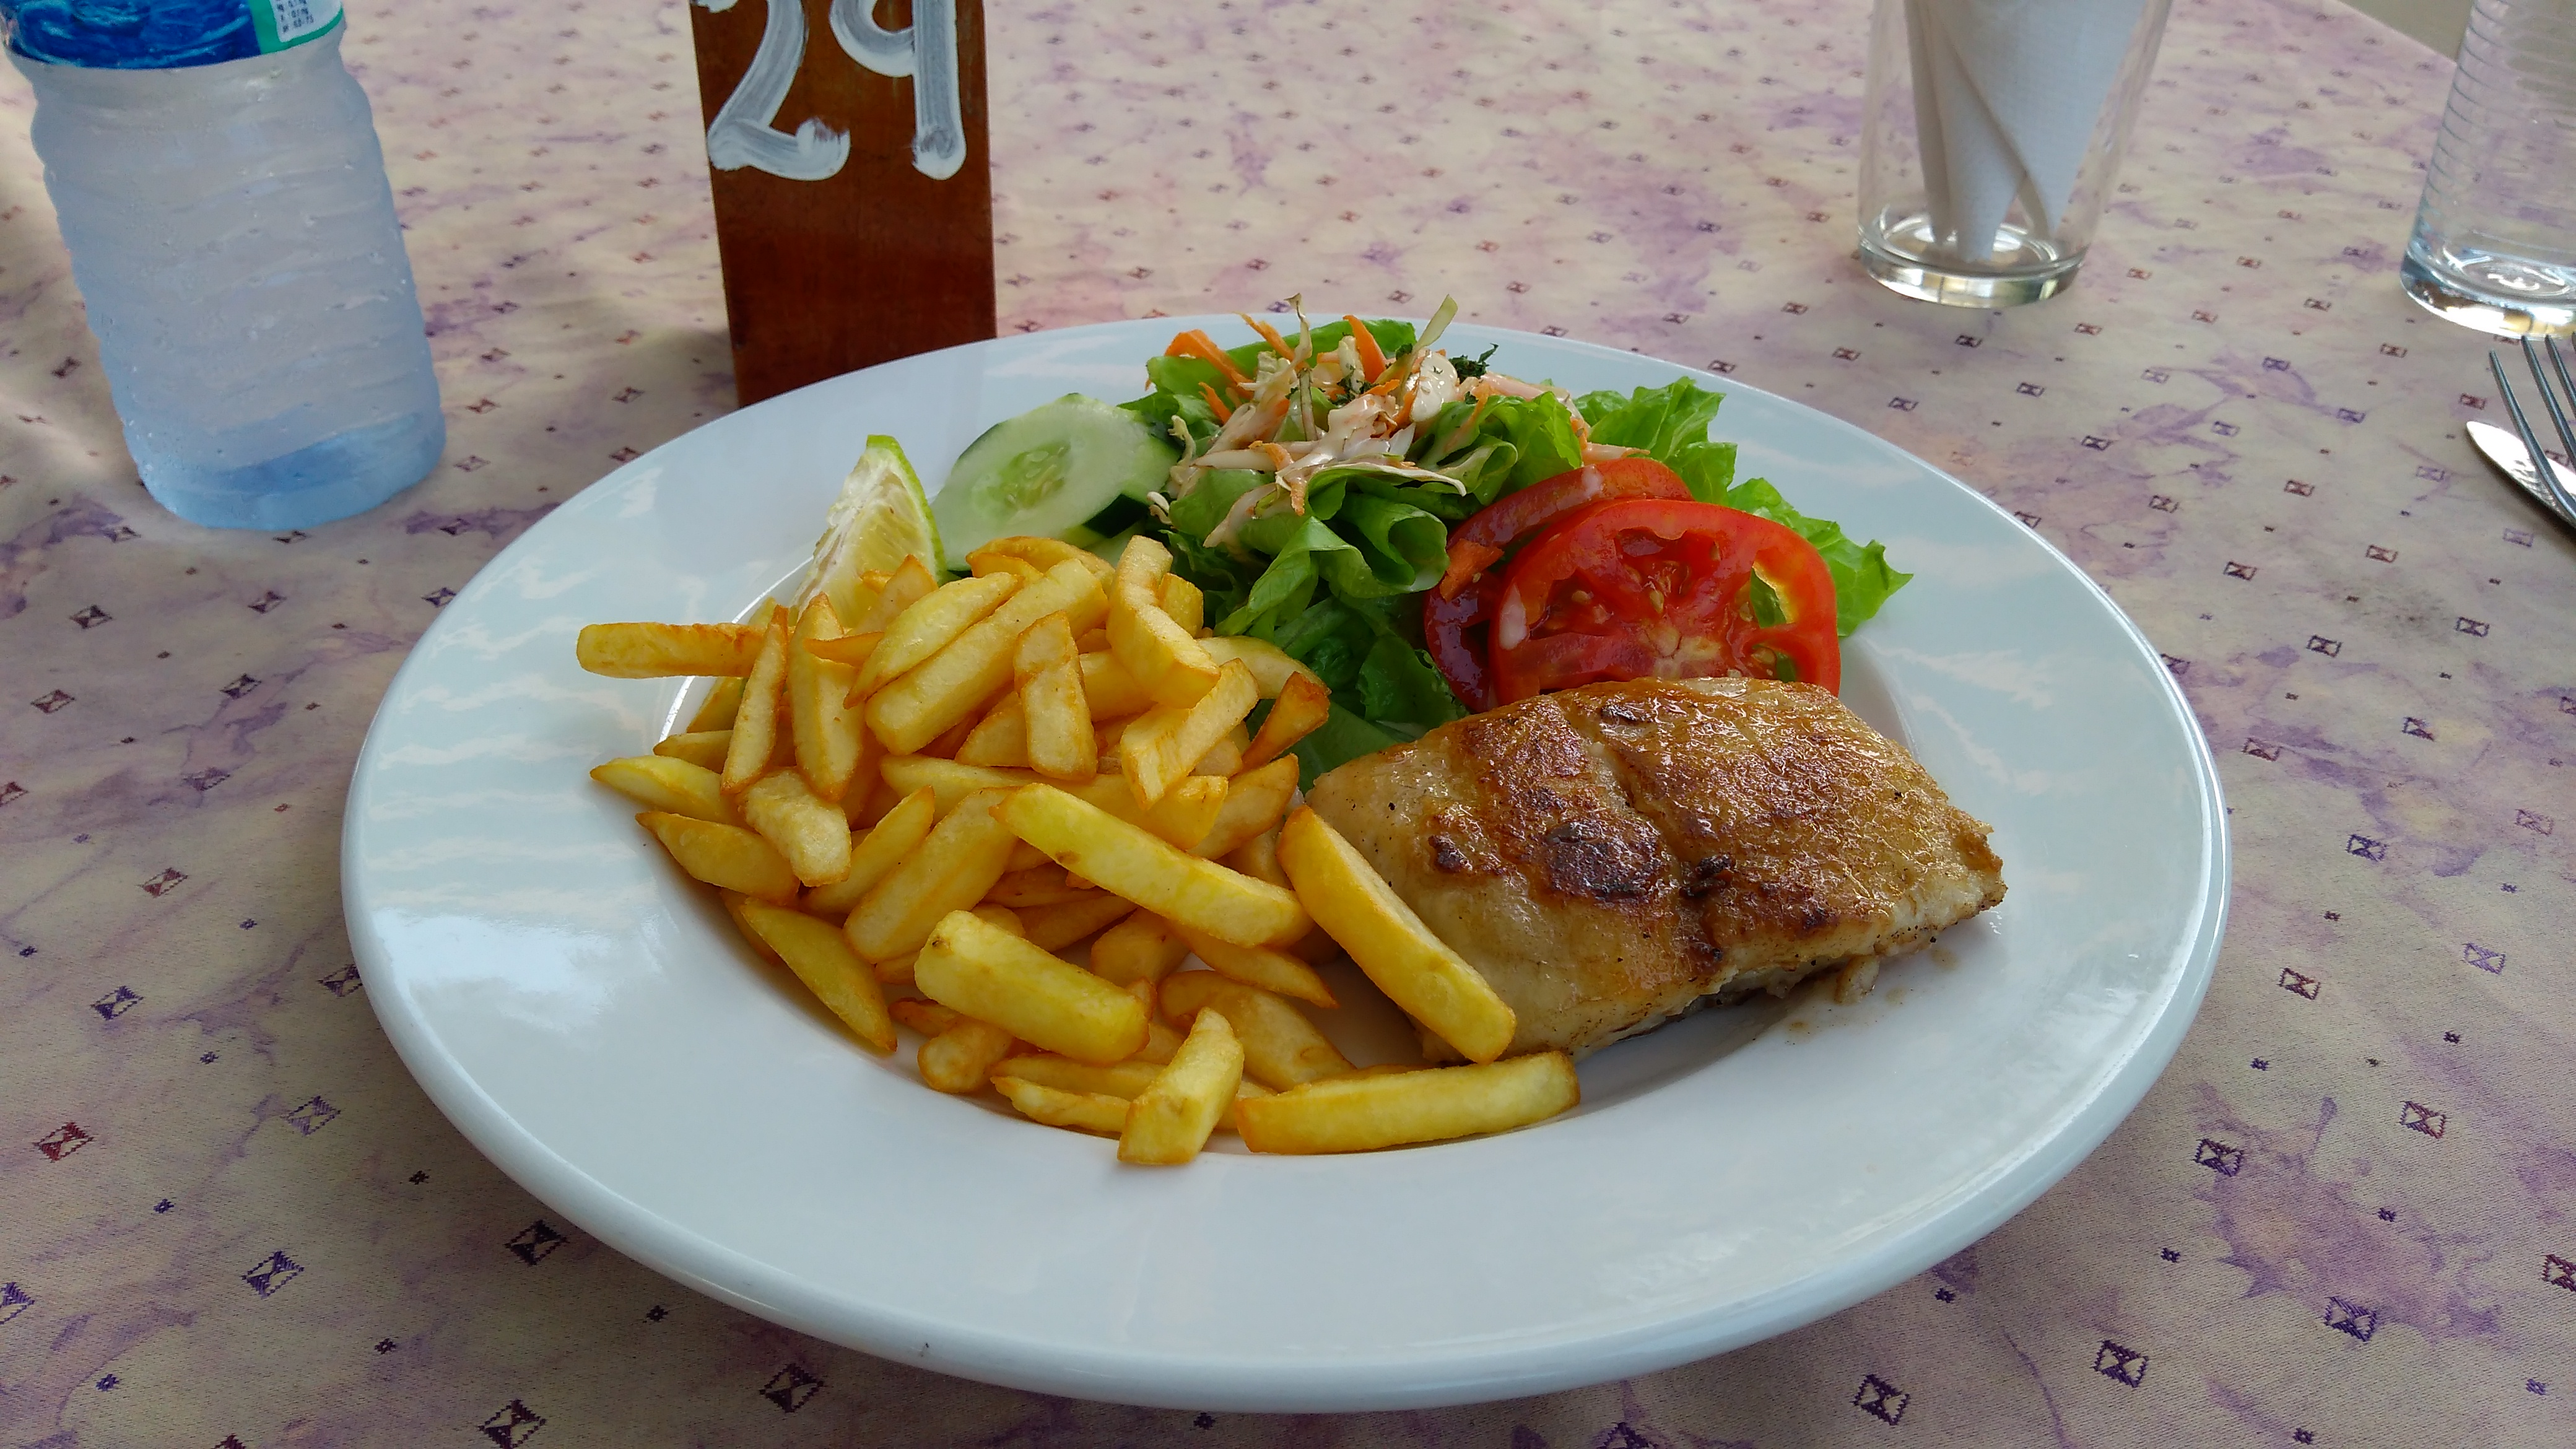 http://foodloader.net/blub_2018-07-23_Red_Snapper_Filet_mit_Salat_und_Pommes.jpg